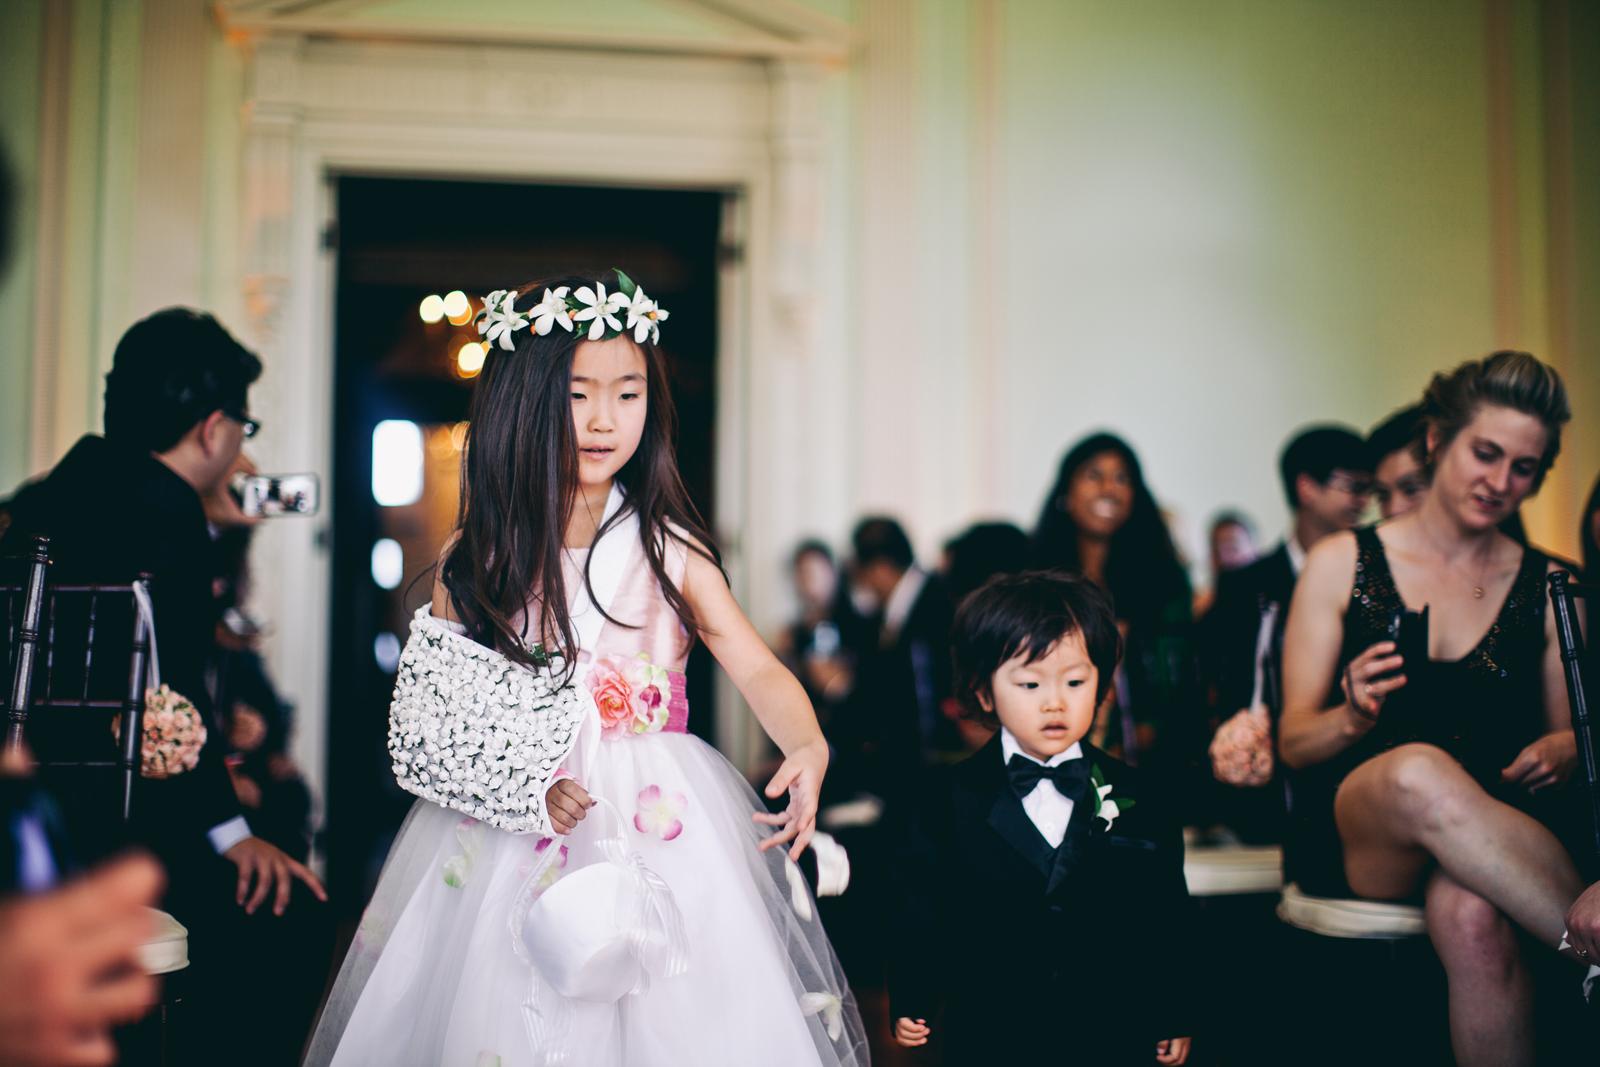 kohl_manison_wedding_photography_sarah_eric_ebony_siovhan_bokeh_photography_042.jpg